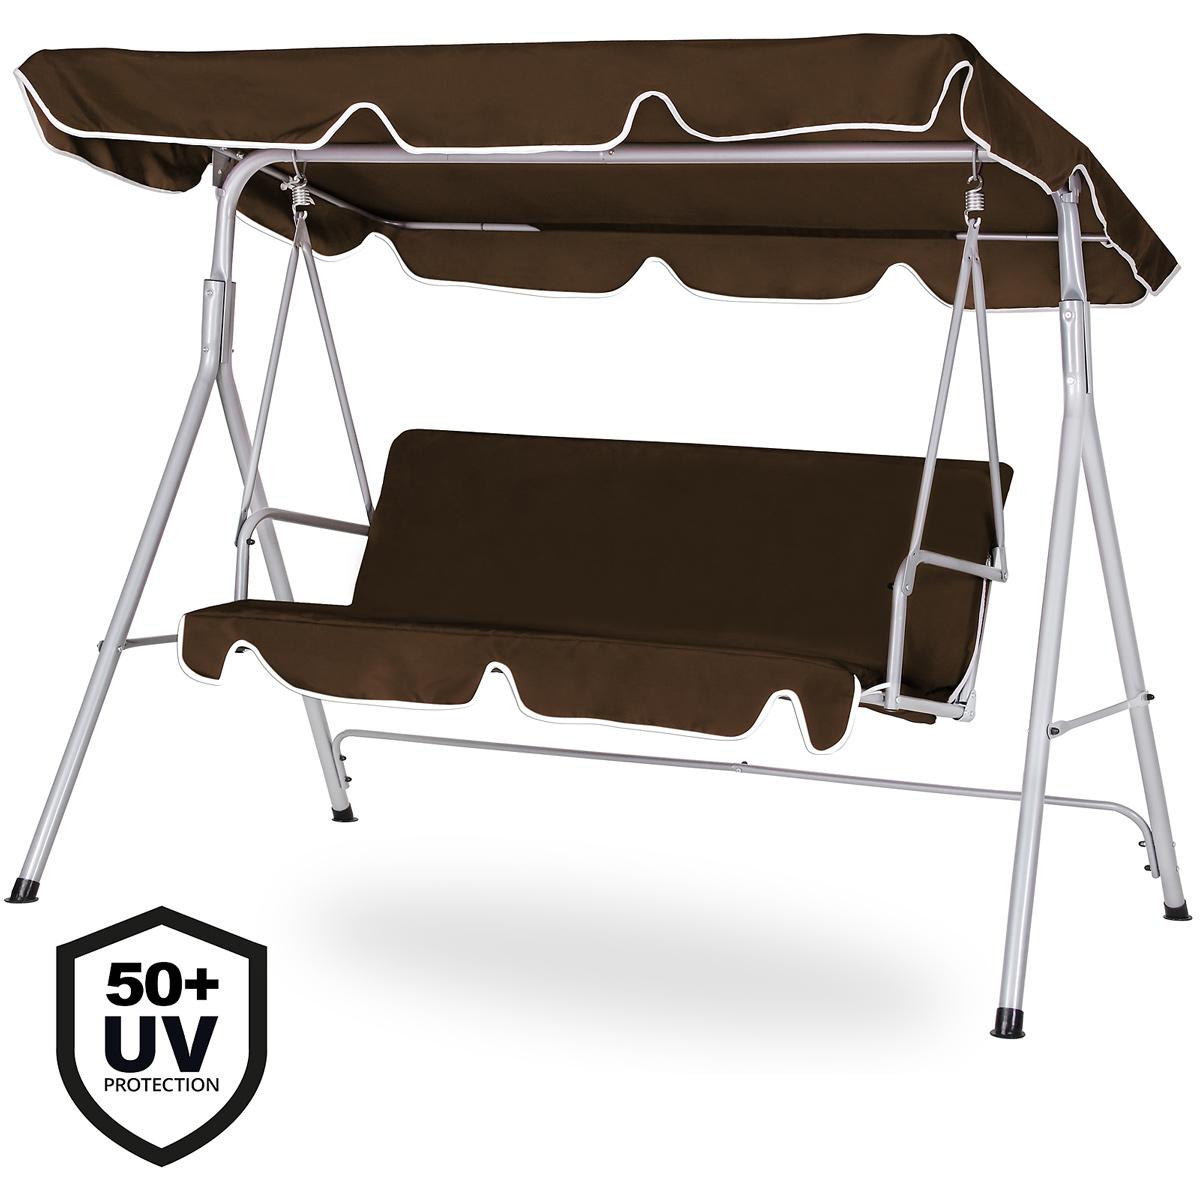 hollywoodschaukel gartenschaukel gartenm bel schaukel. Black Bedroom Furniture Sets. Home Design Ideas